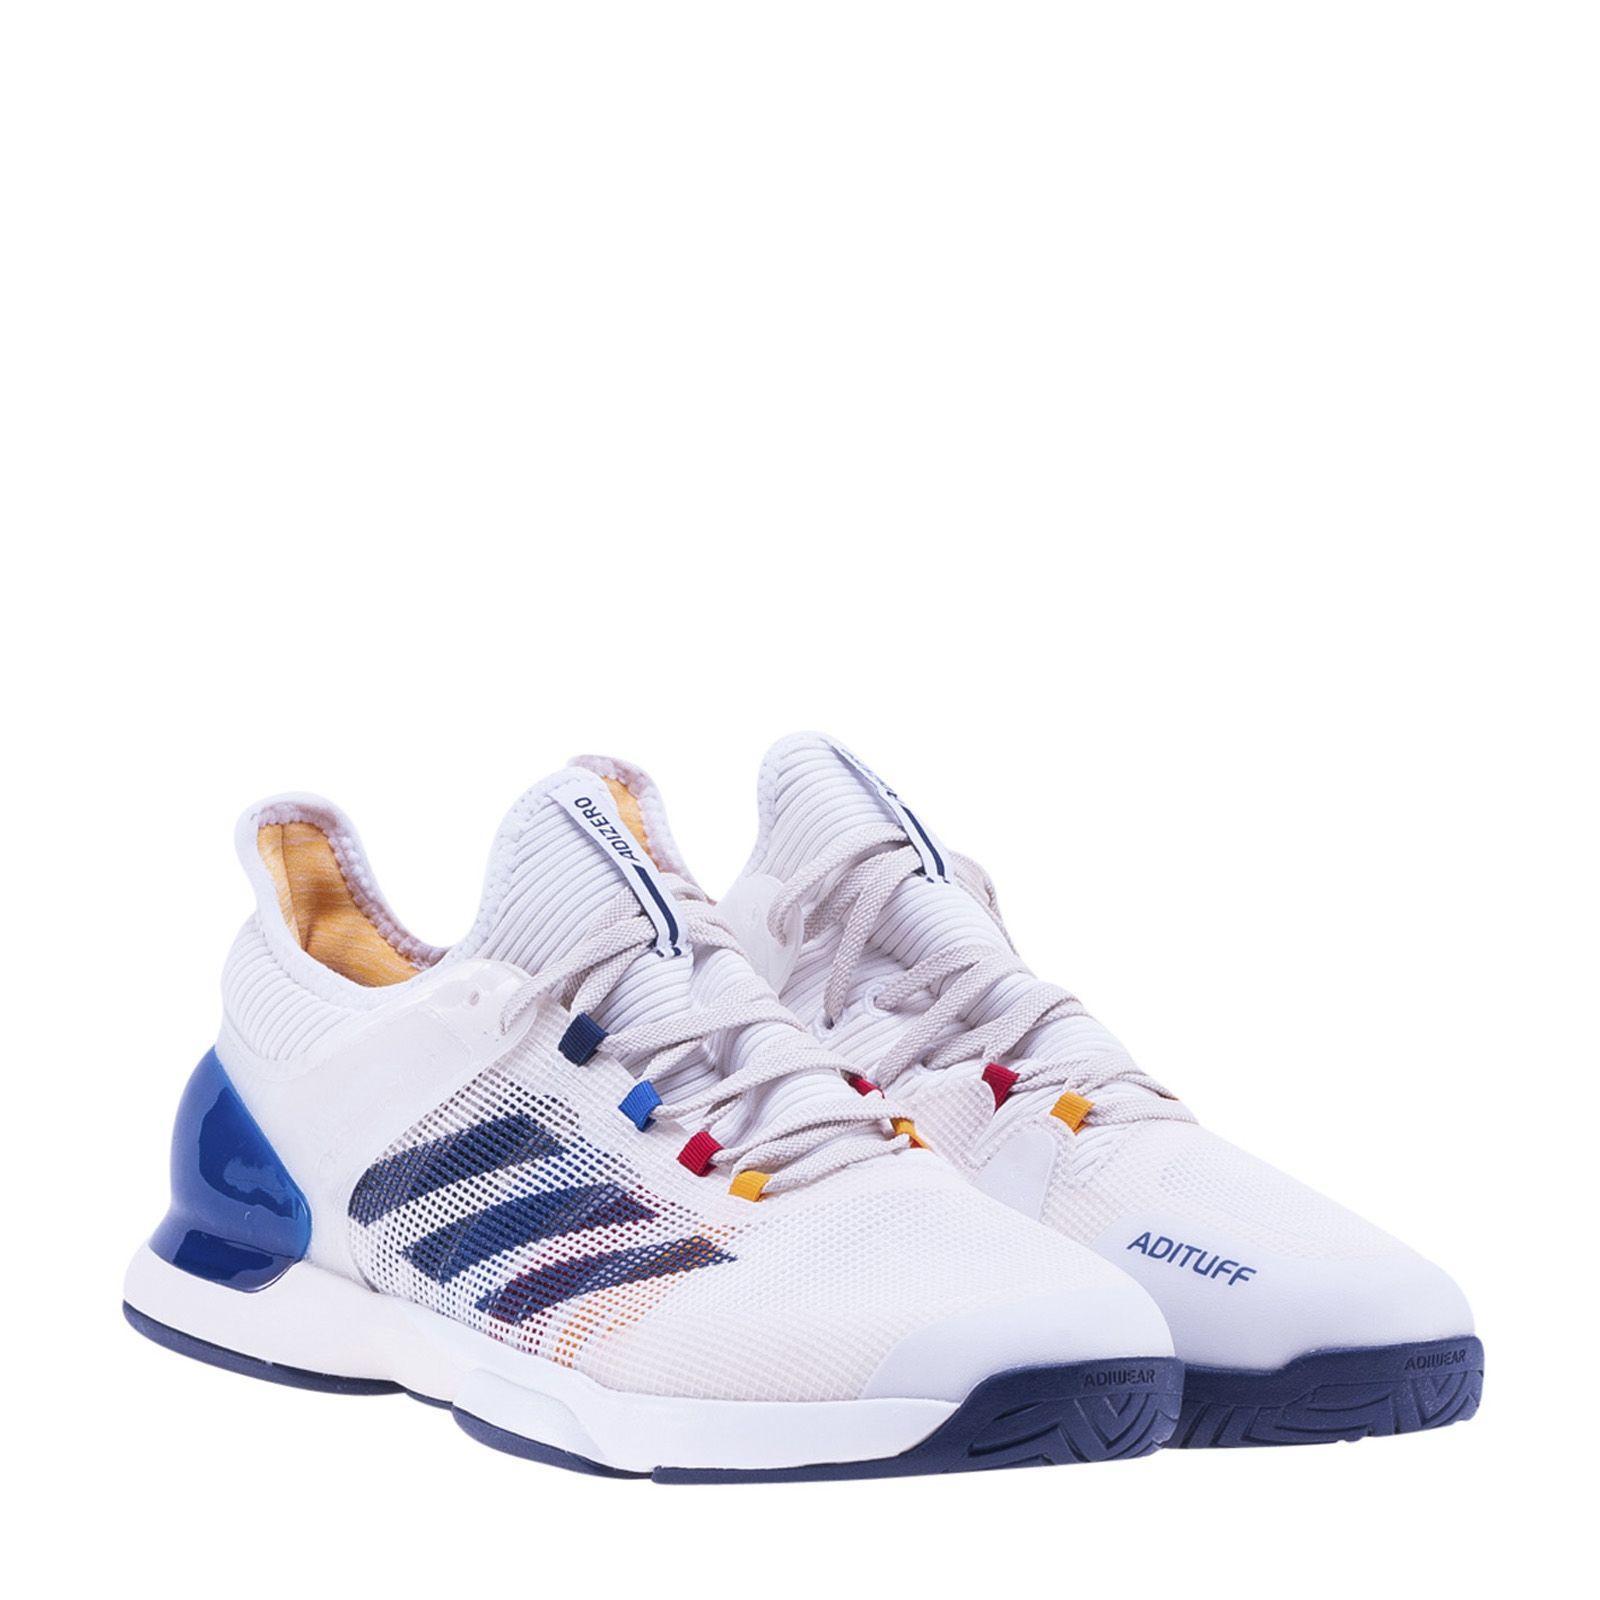 a19646d58153f Adidas Originals X Pharrell Williams Adidas Adizero Ubersonic 2.0 In White